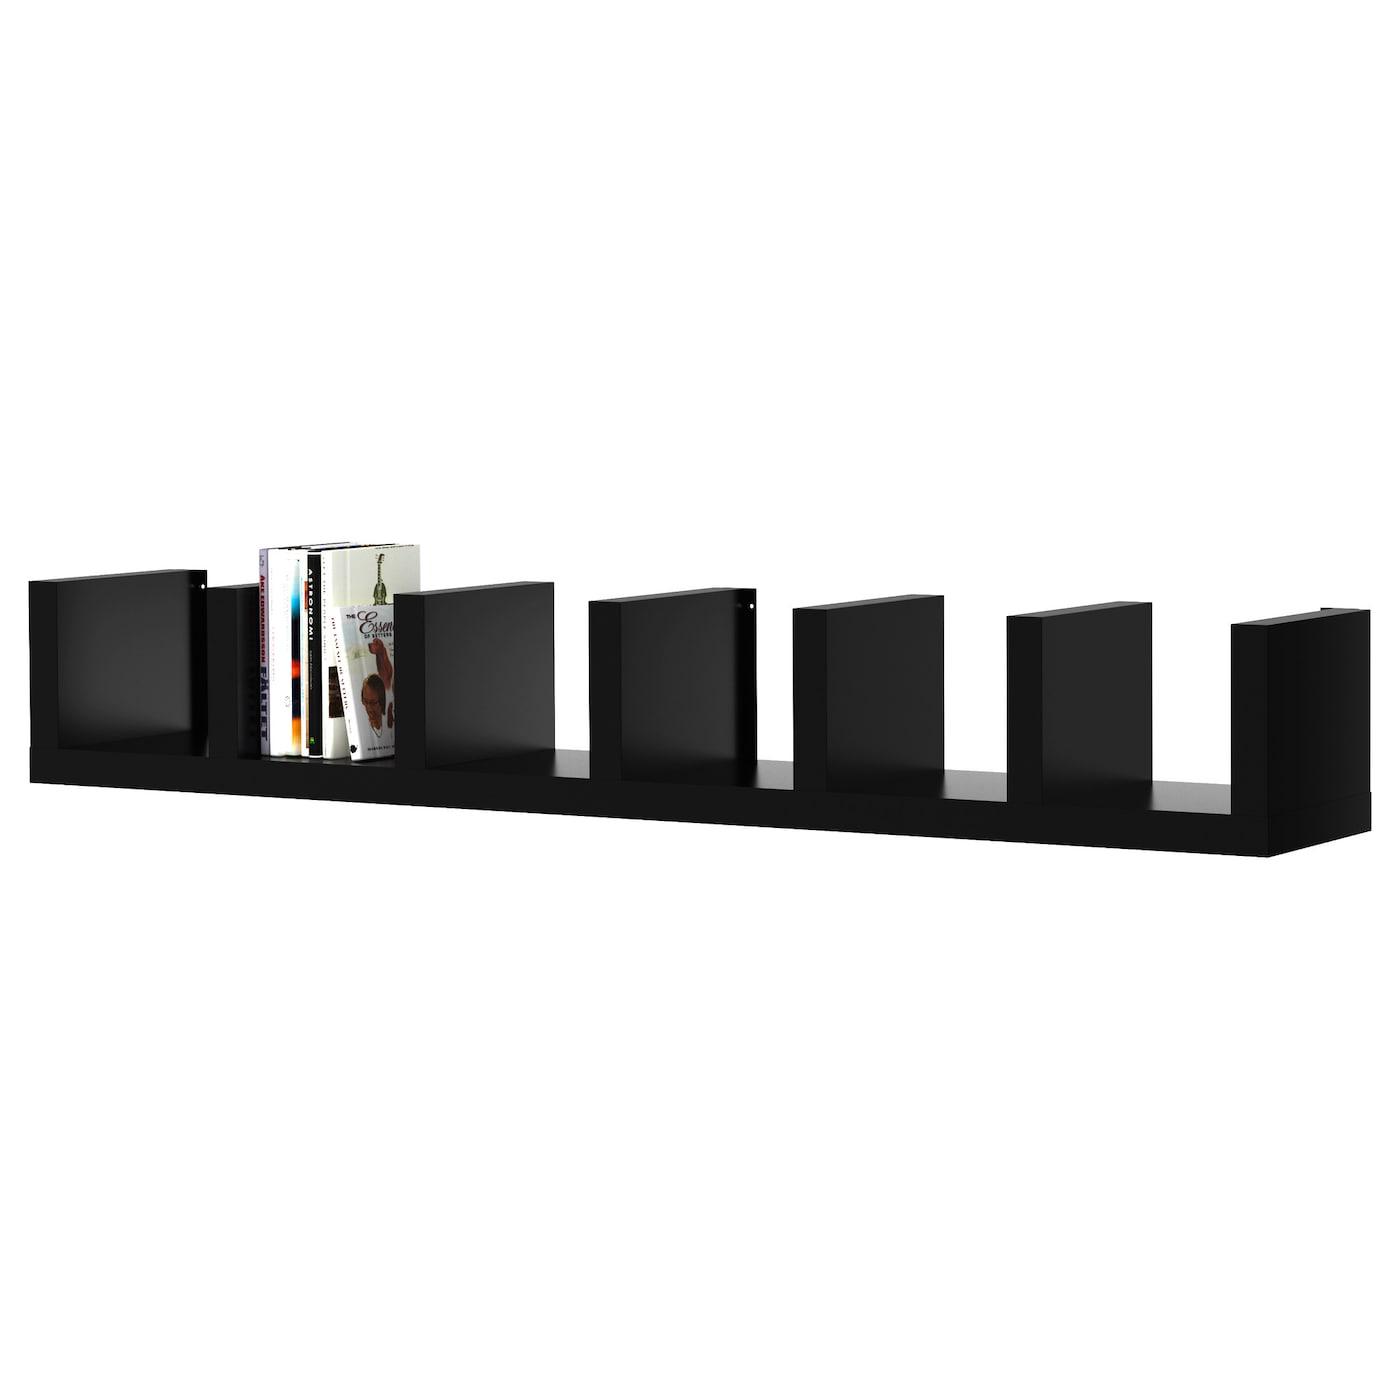 Lack wall shelf unit black 30 x 190 cm ikea - Libreria ikea lack ...